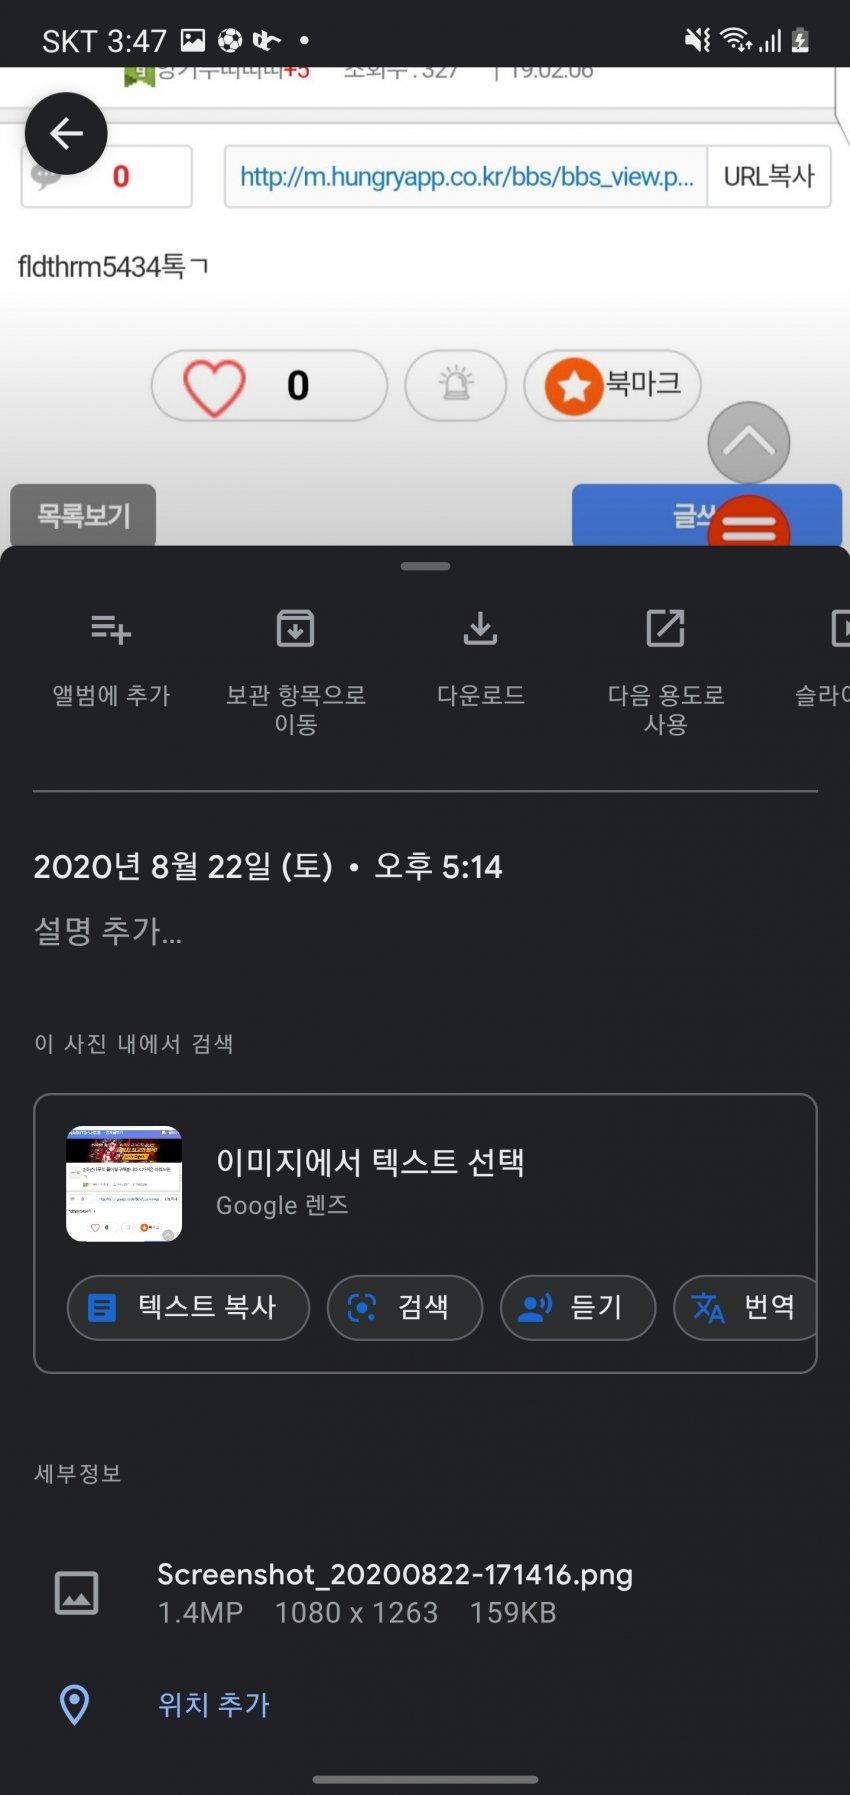 viewimage.php?id=2fb1d125eec231a865&no=24b0d769e1d32ca73feb86fa11d02831b7cca0f2855e21730c724febbe0b6d51101bffad3c6c37d8525cb51f56a701fb171878bd0f5156782e4162a4494866057b579457cfc036fb917362ff6aa2bbc0392a59b55940290d2e16aa59f85a401e899293aef3c4